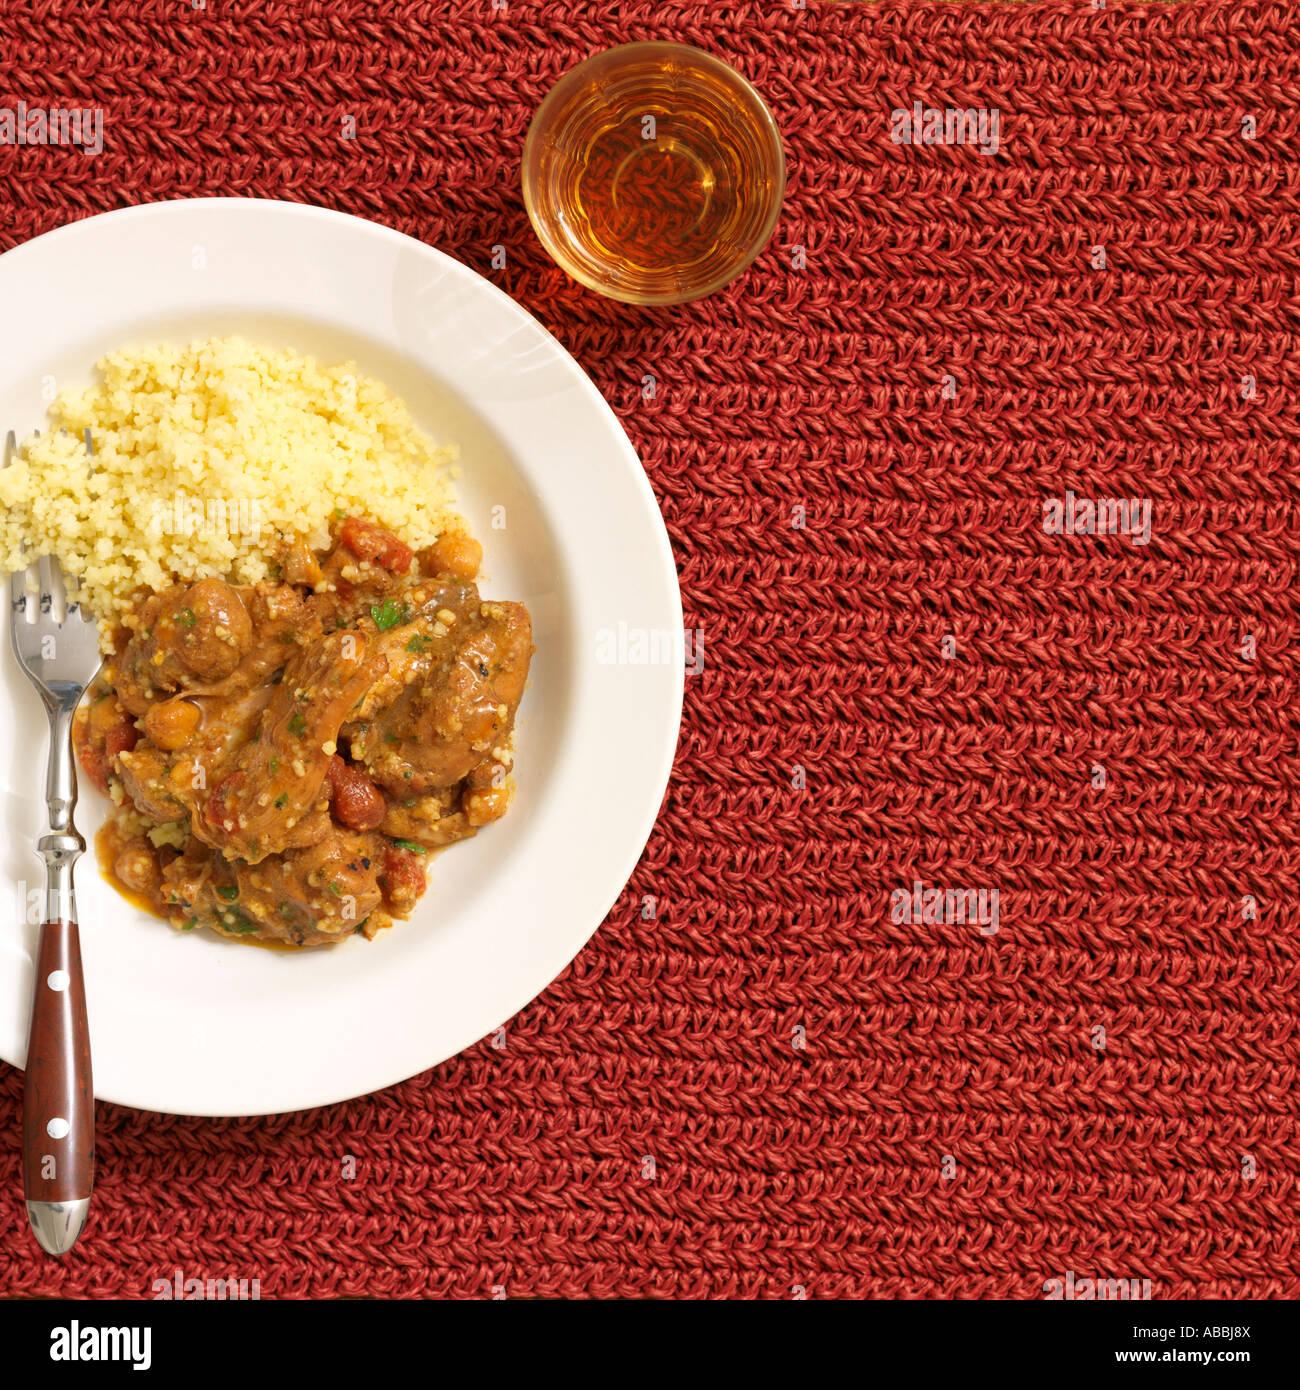 Chicken Tagine - Stock Image